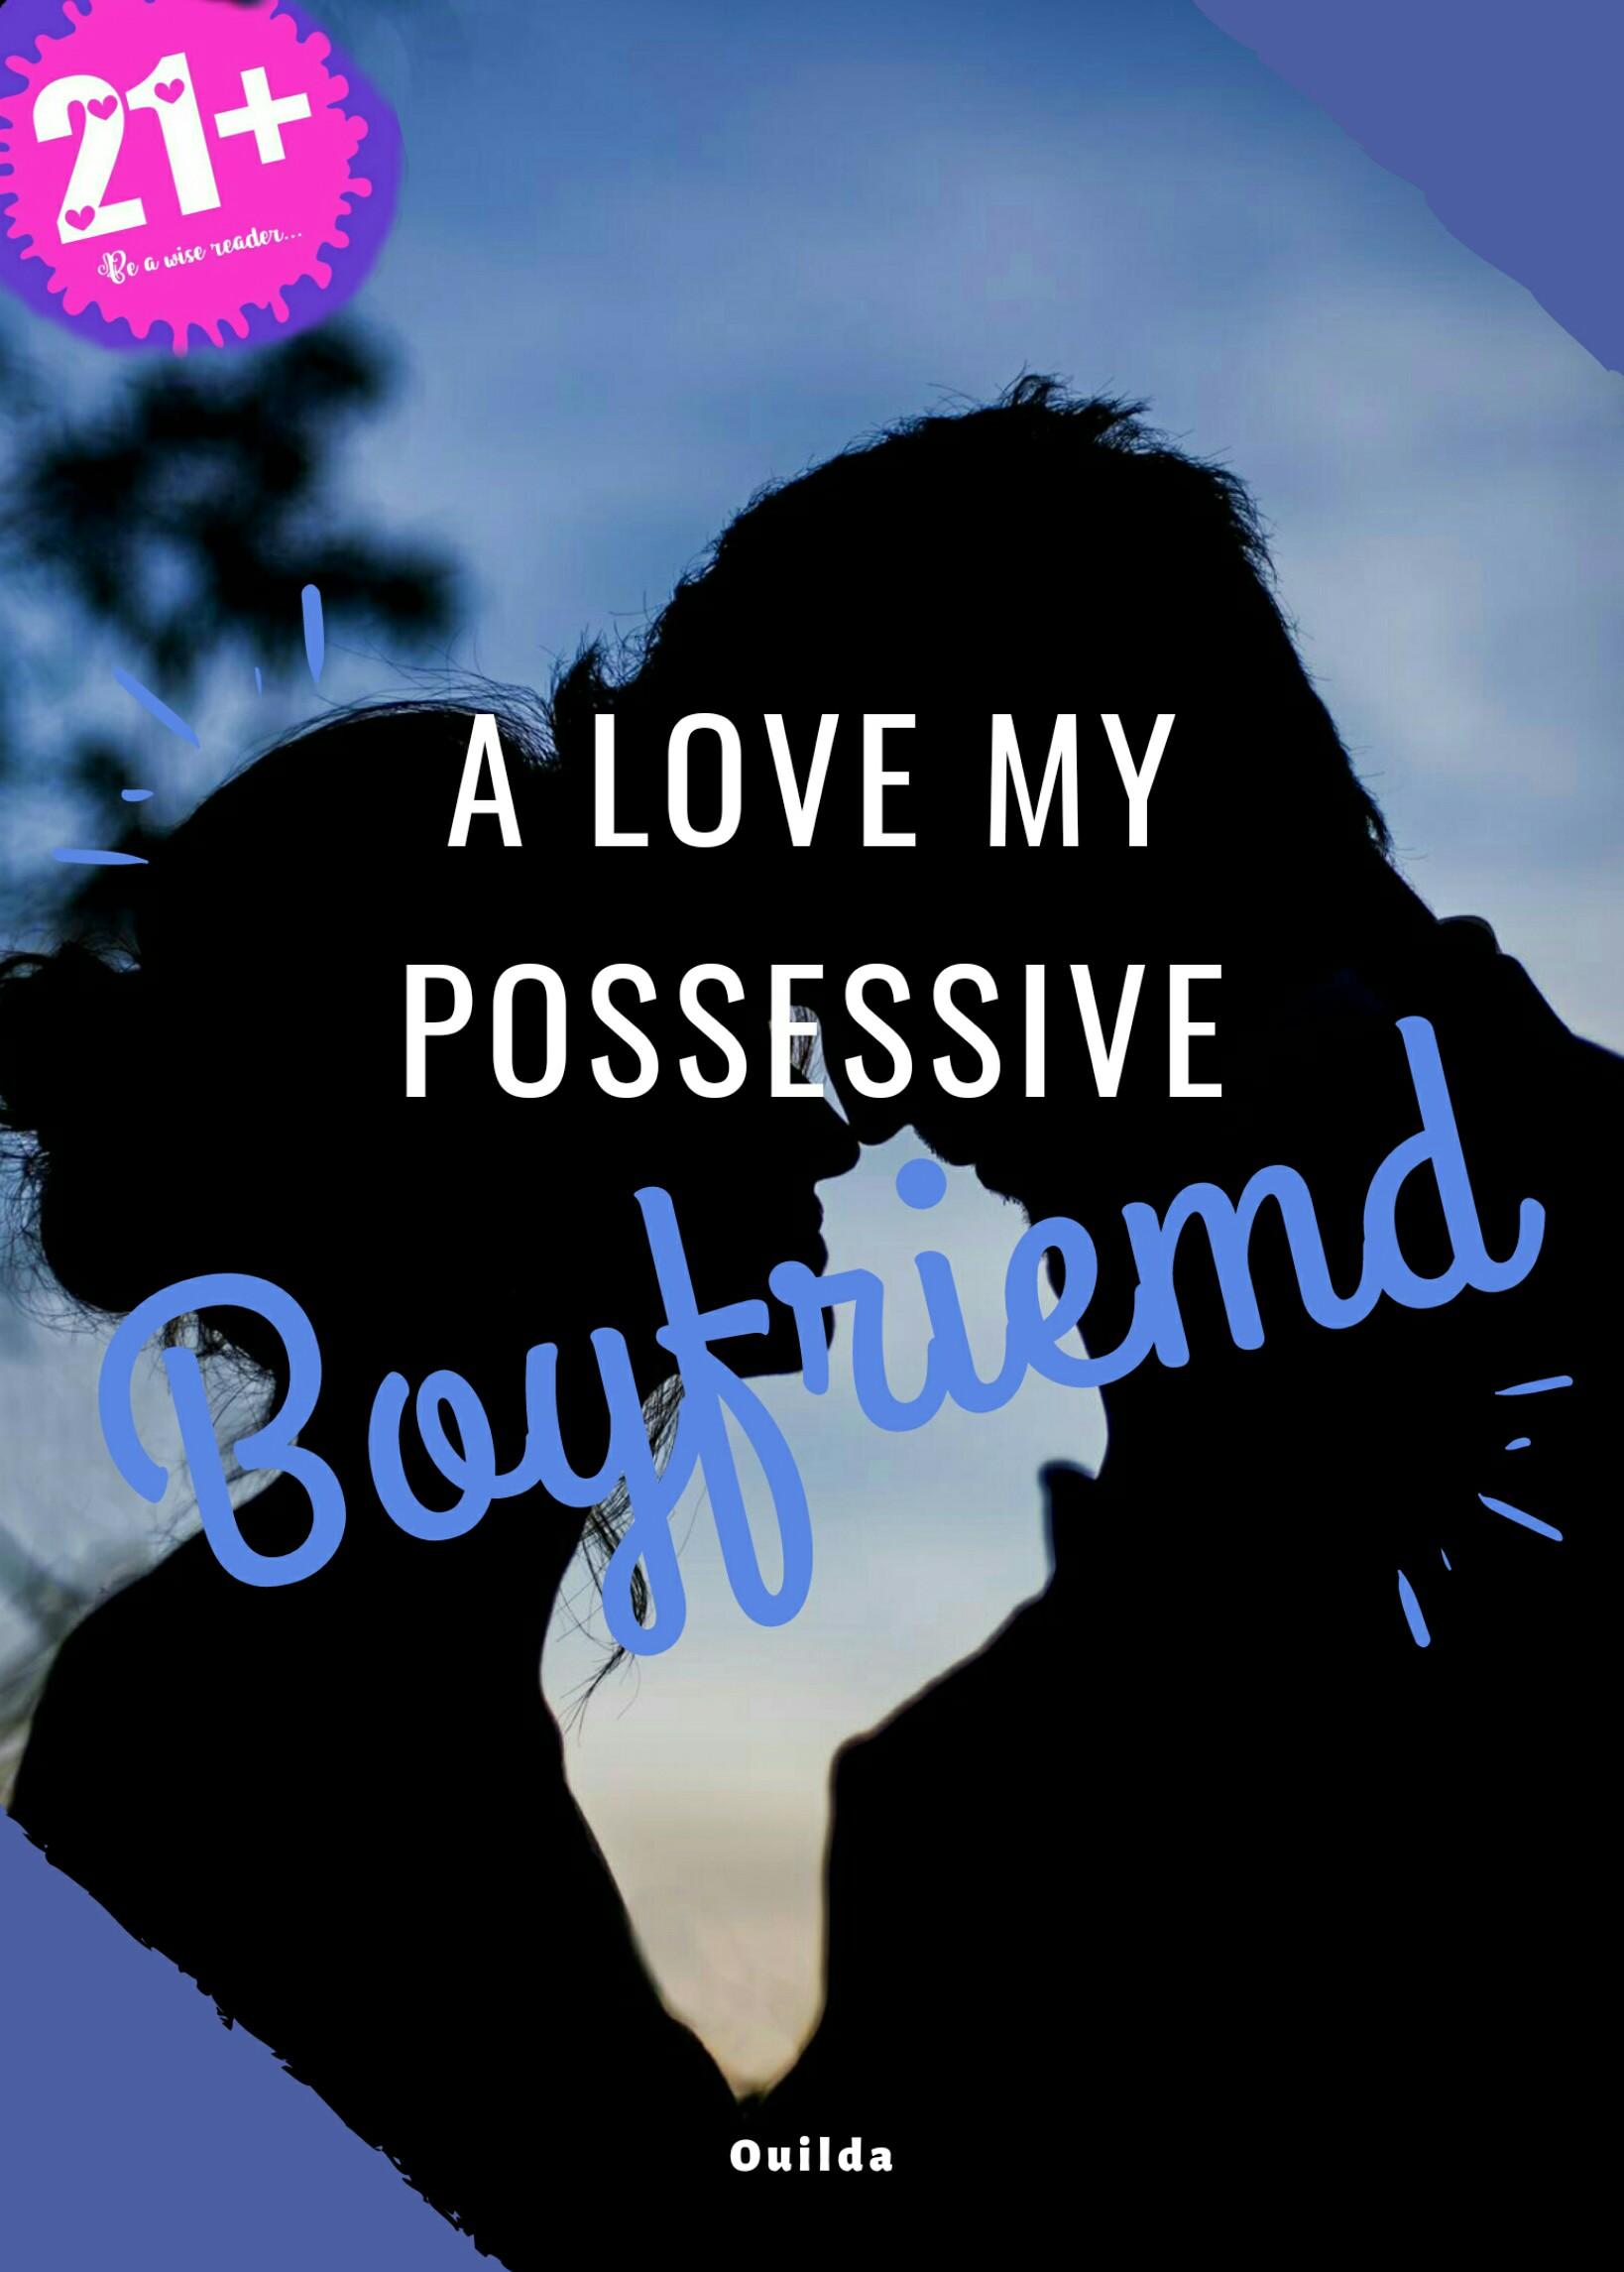 A Love My Possesive Boyfriend